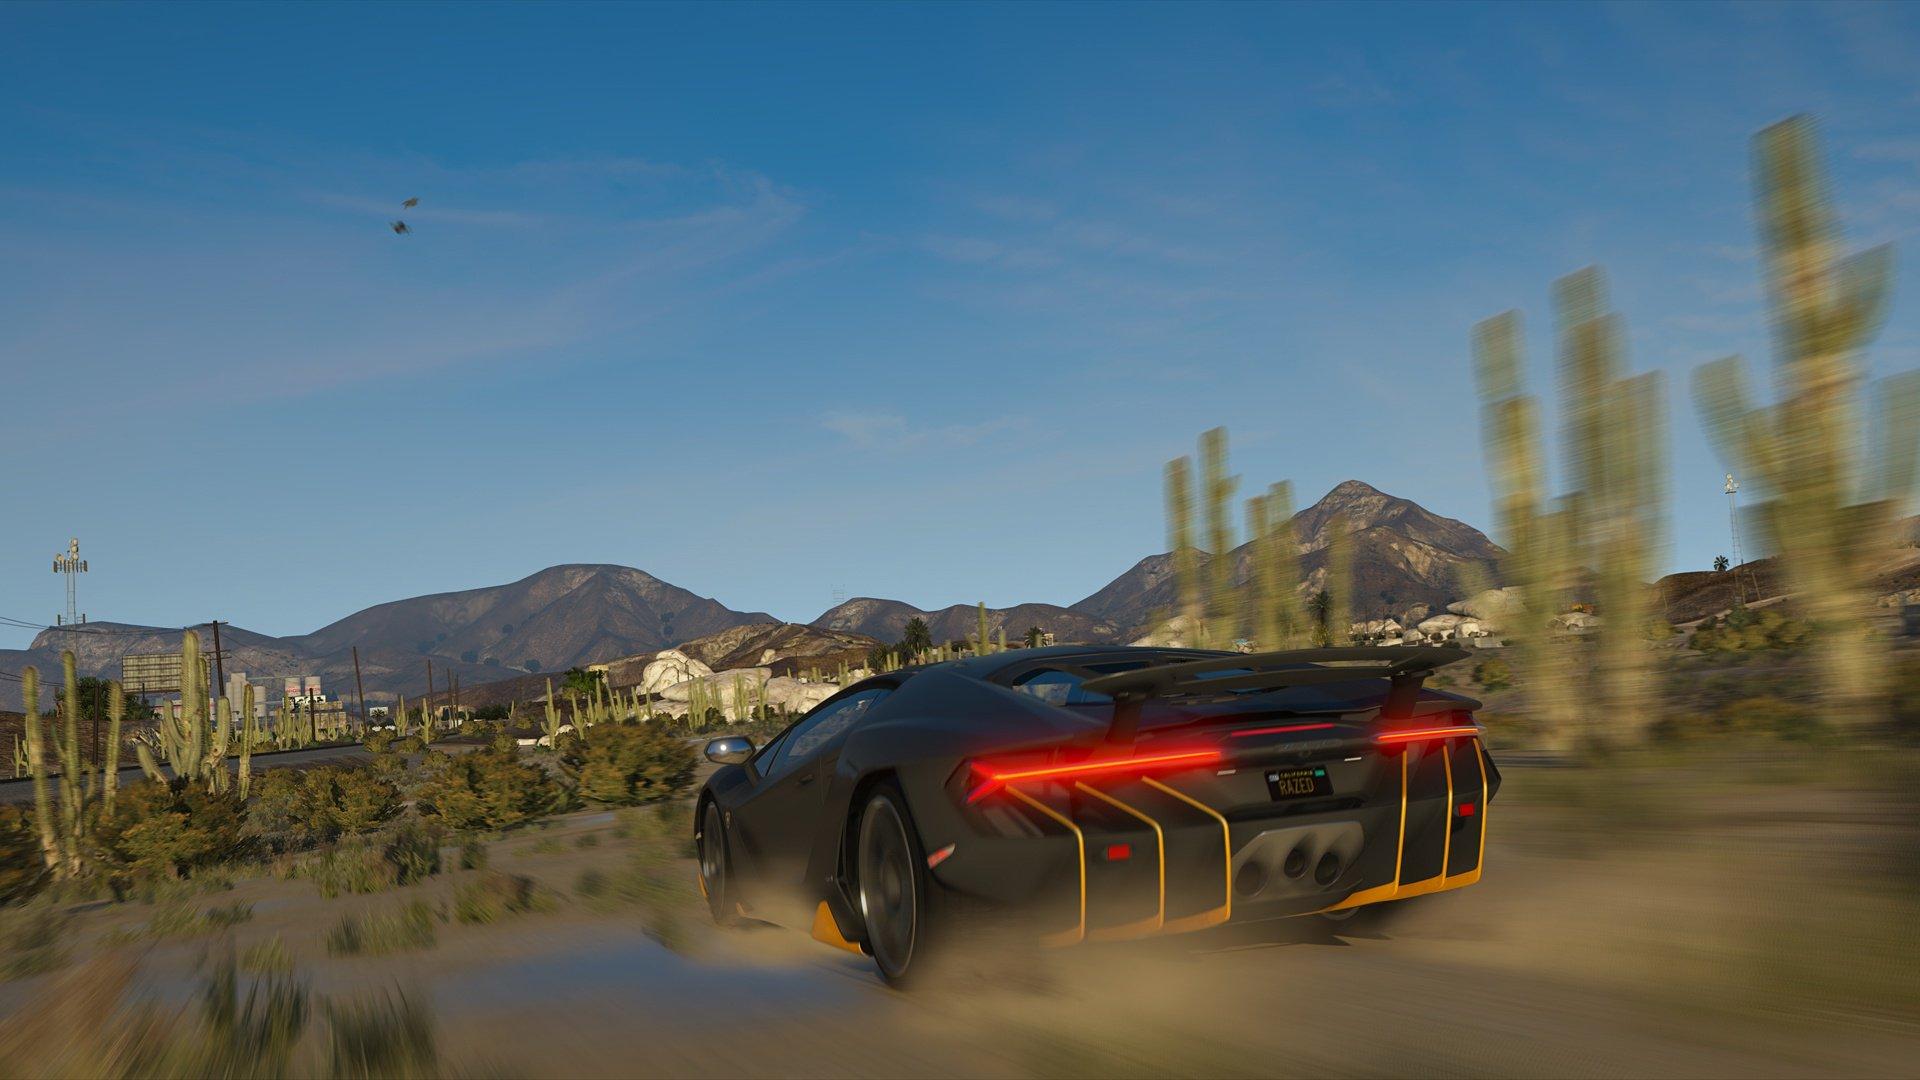 GTA 5 NaturalVision Remastered overhaul mod is stunning | PC